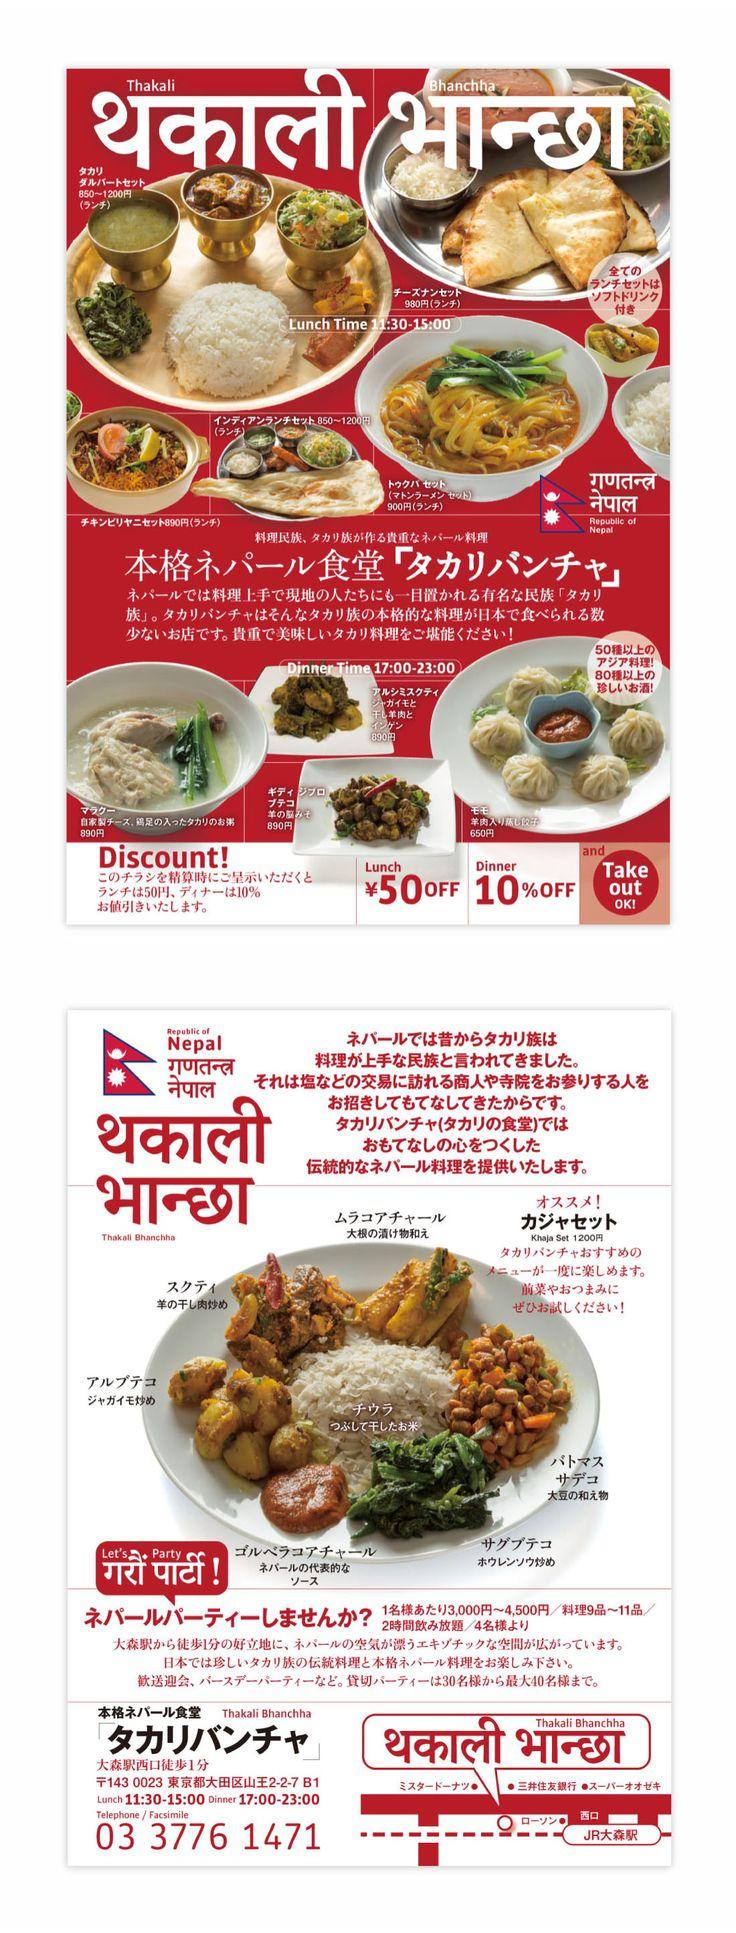 Flyer / フライヤー / チラシ / タカリバンチャ ネパール料理 / Thakali Bhanchha Nepalese Cuisine